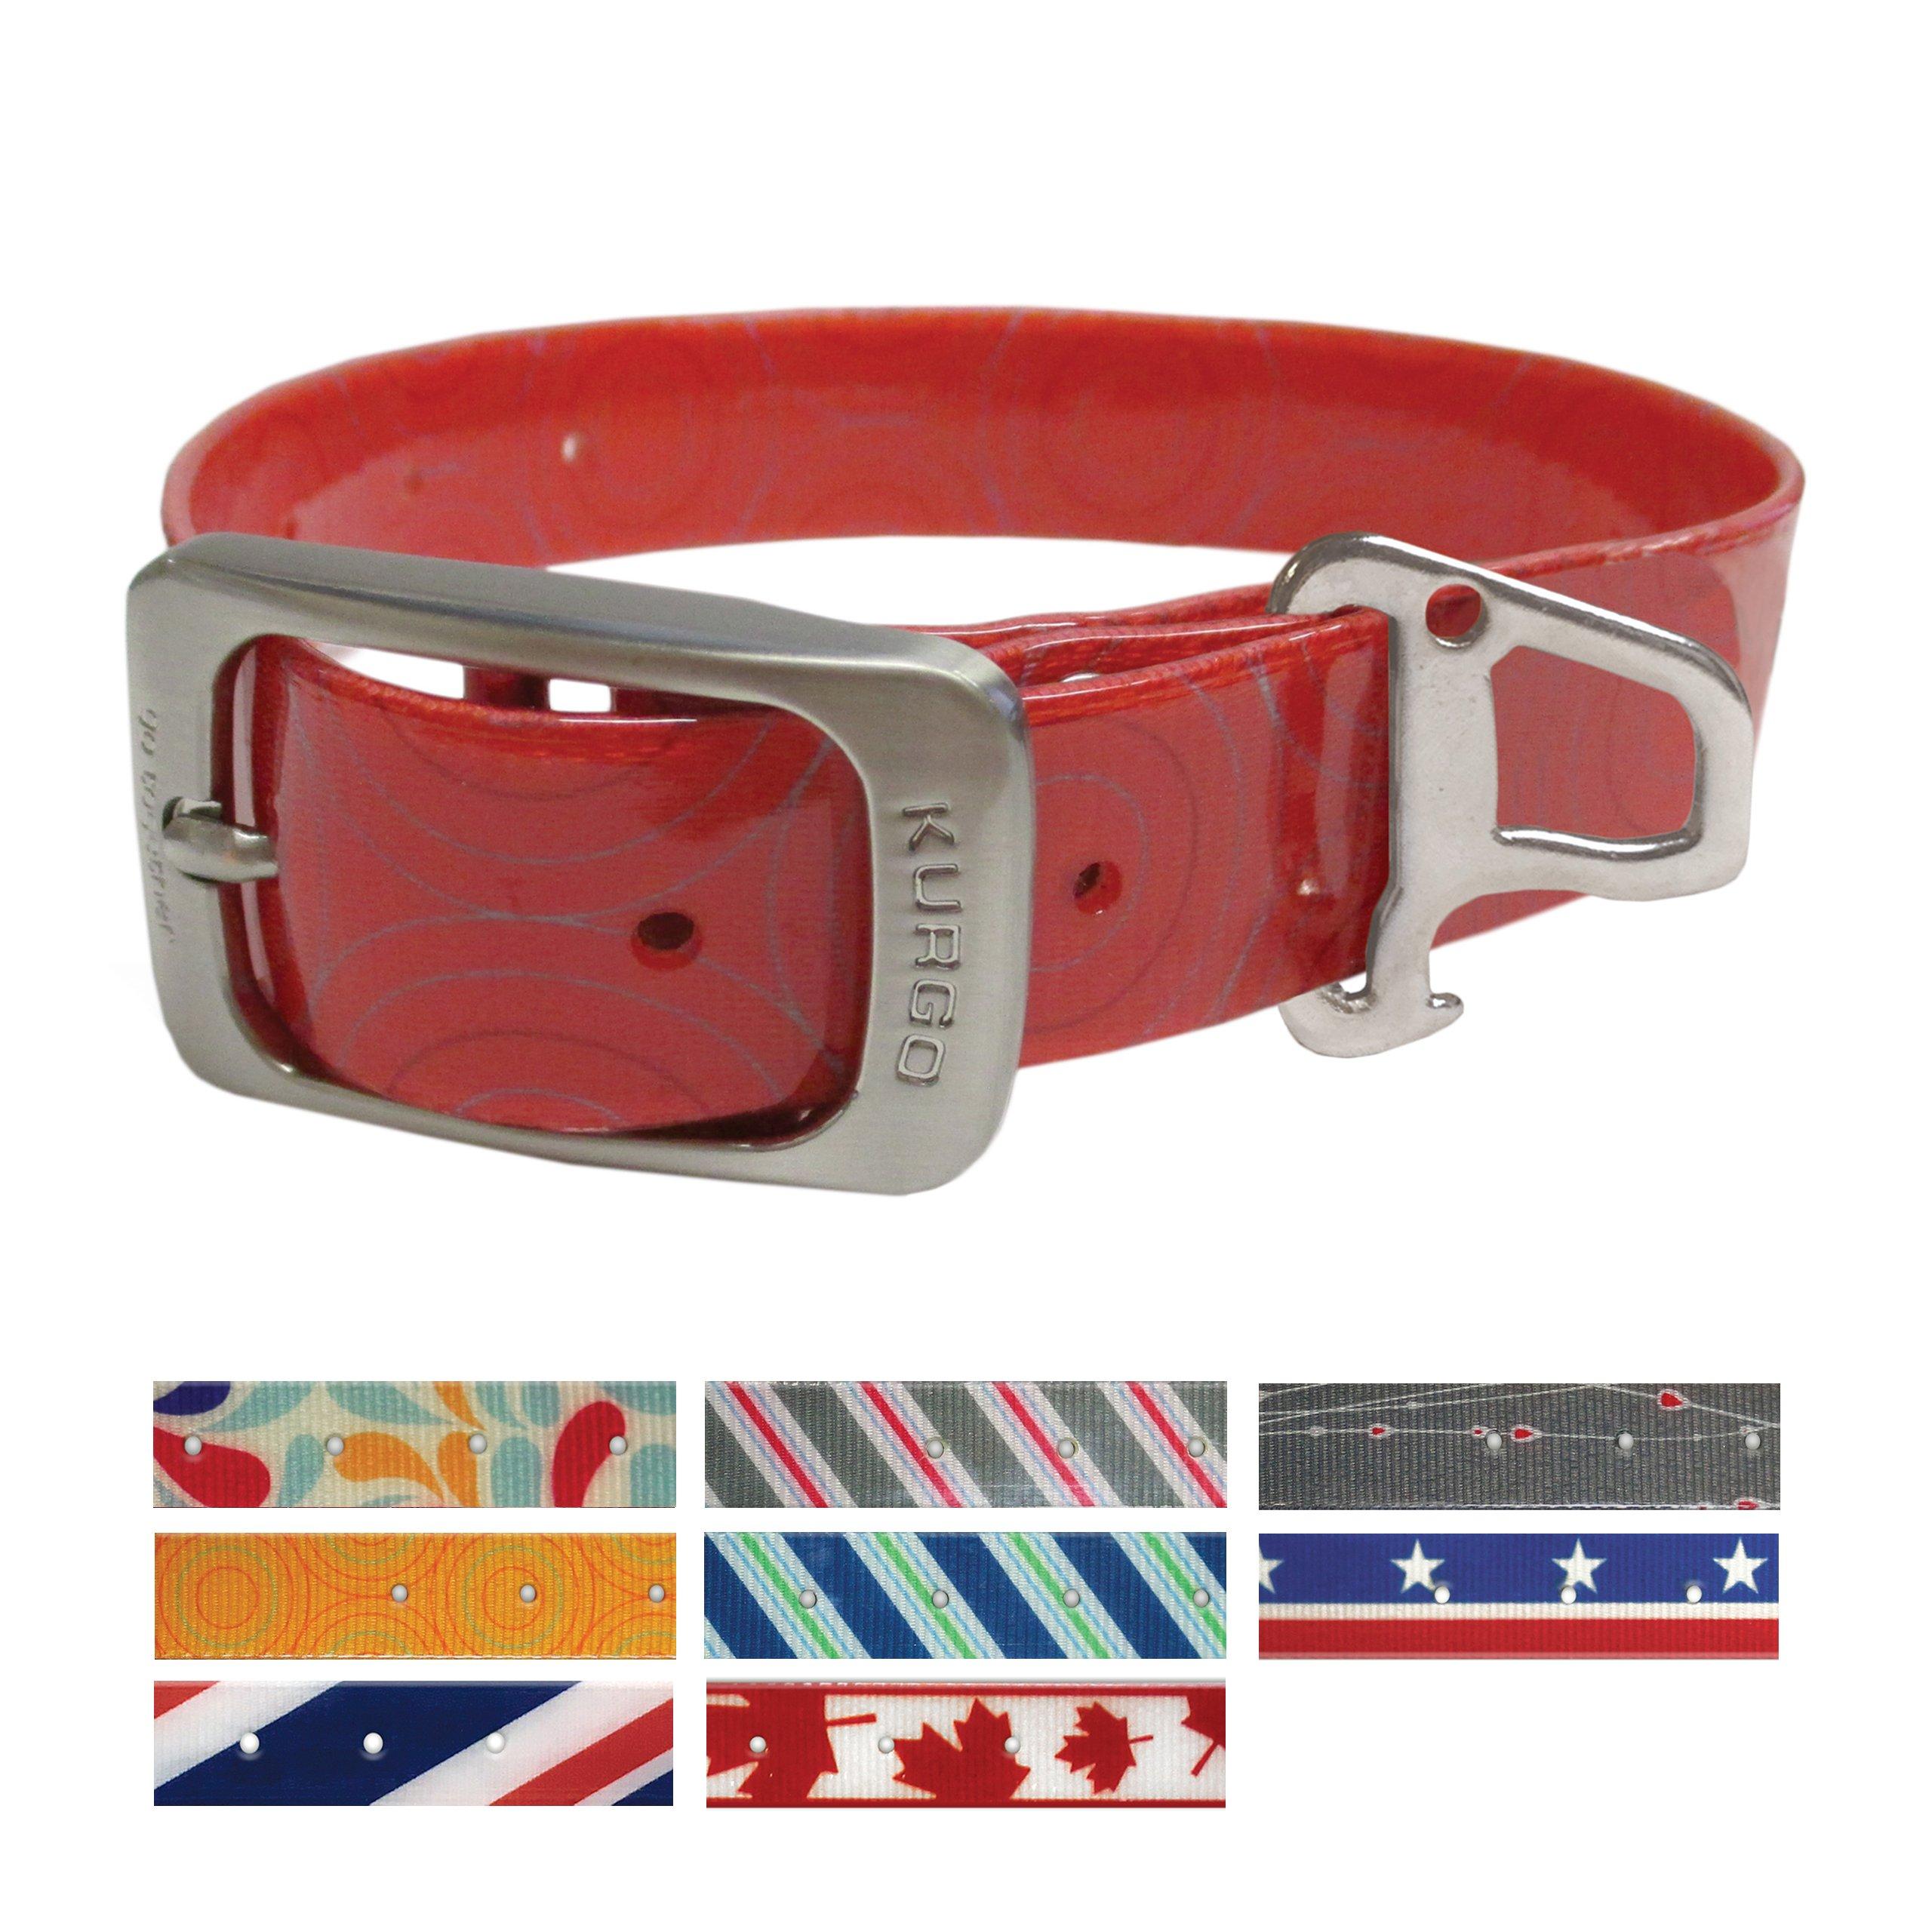 Kurgo Muck Collar Crop Circles Barn Red Collar Waterproof Dog Collar, Small